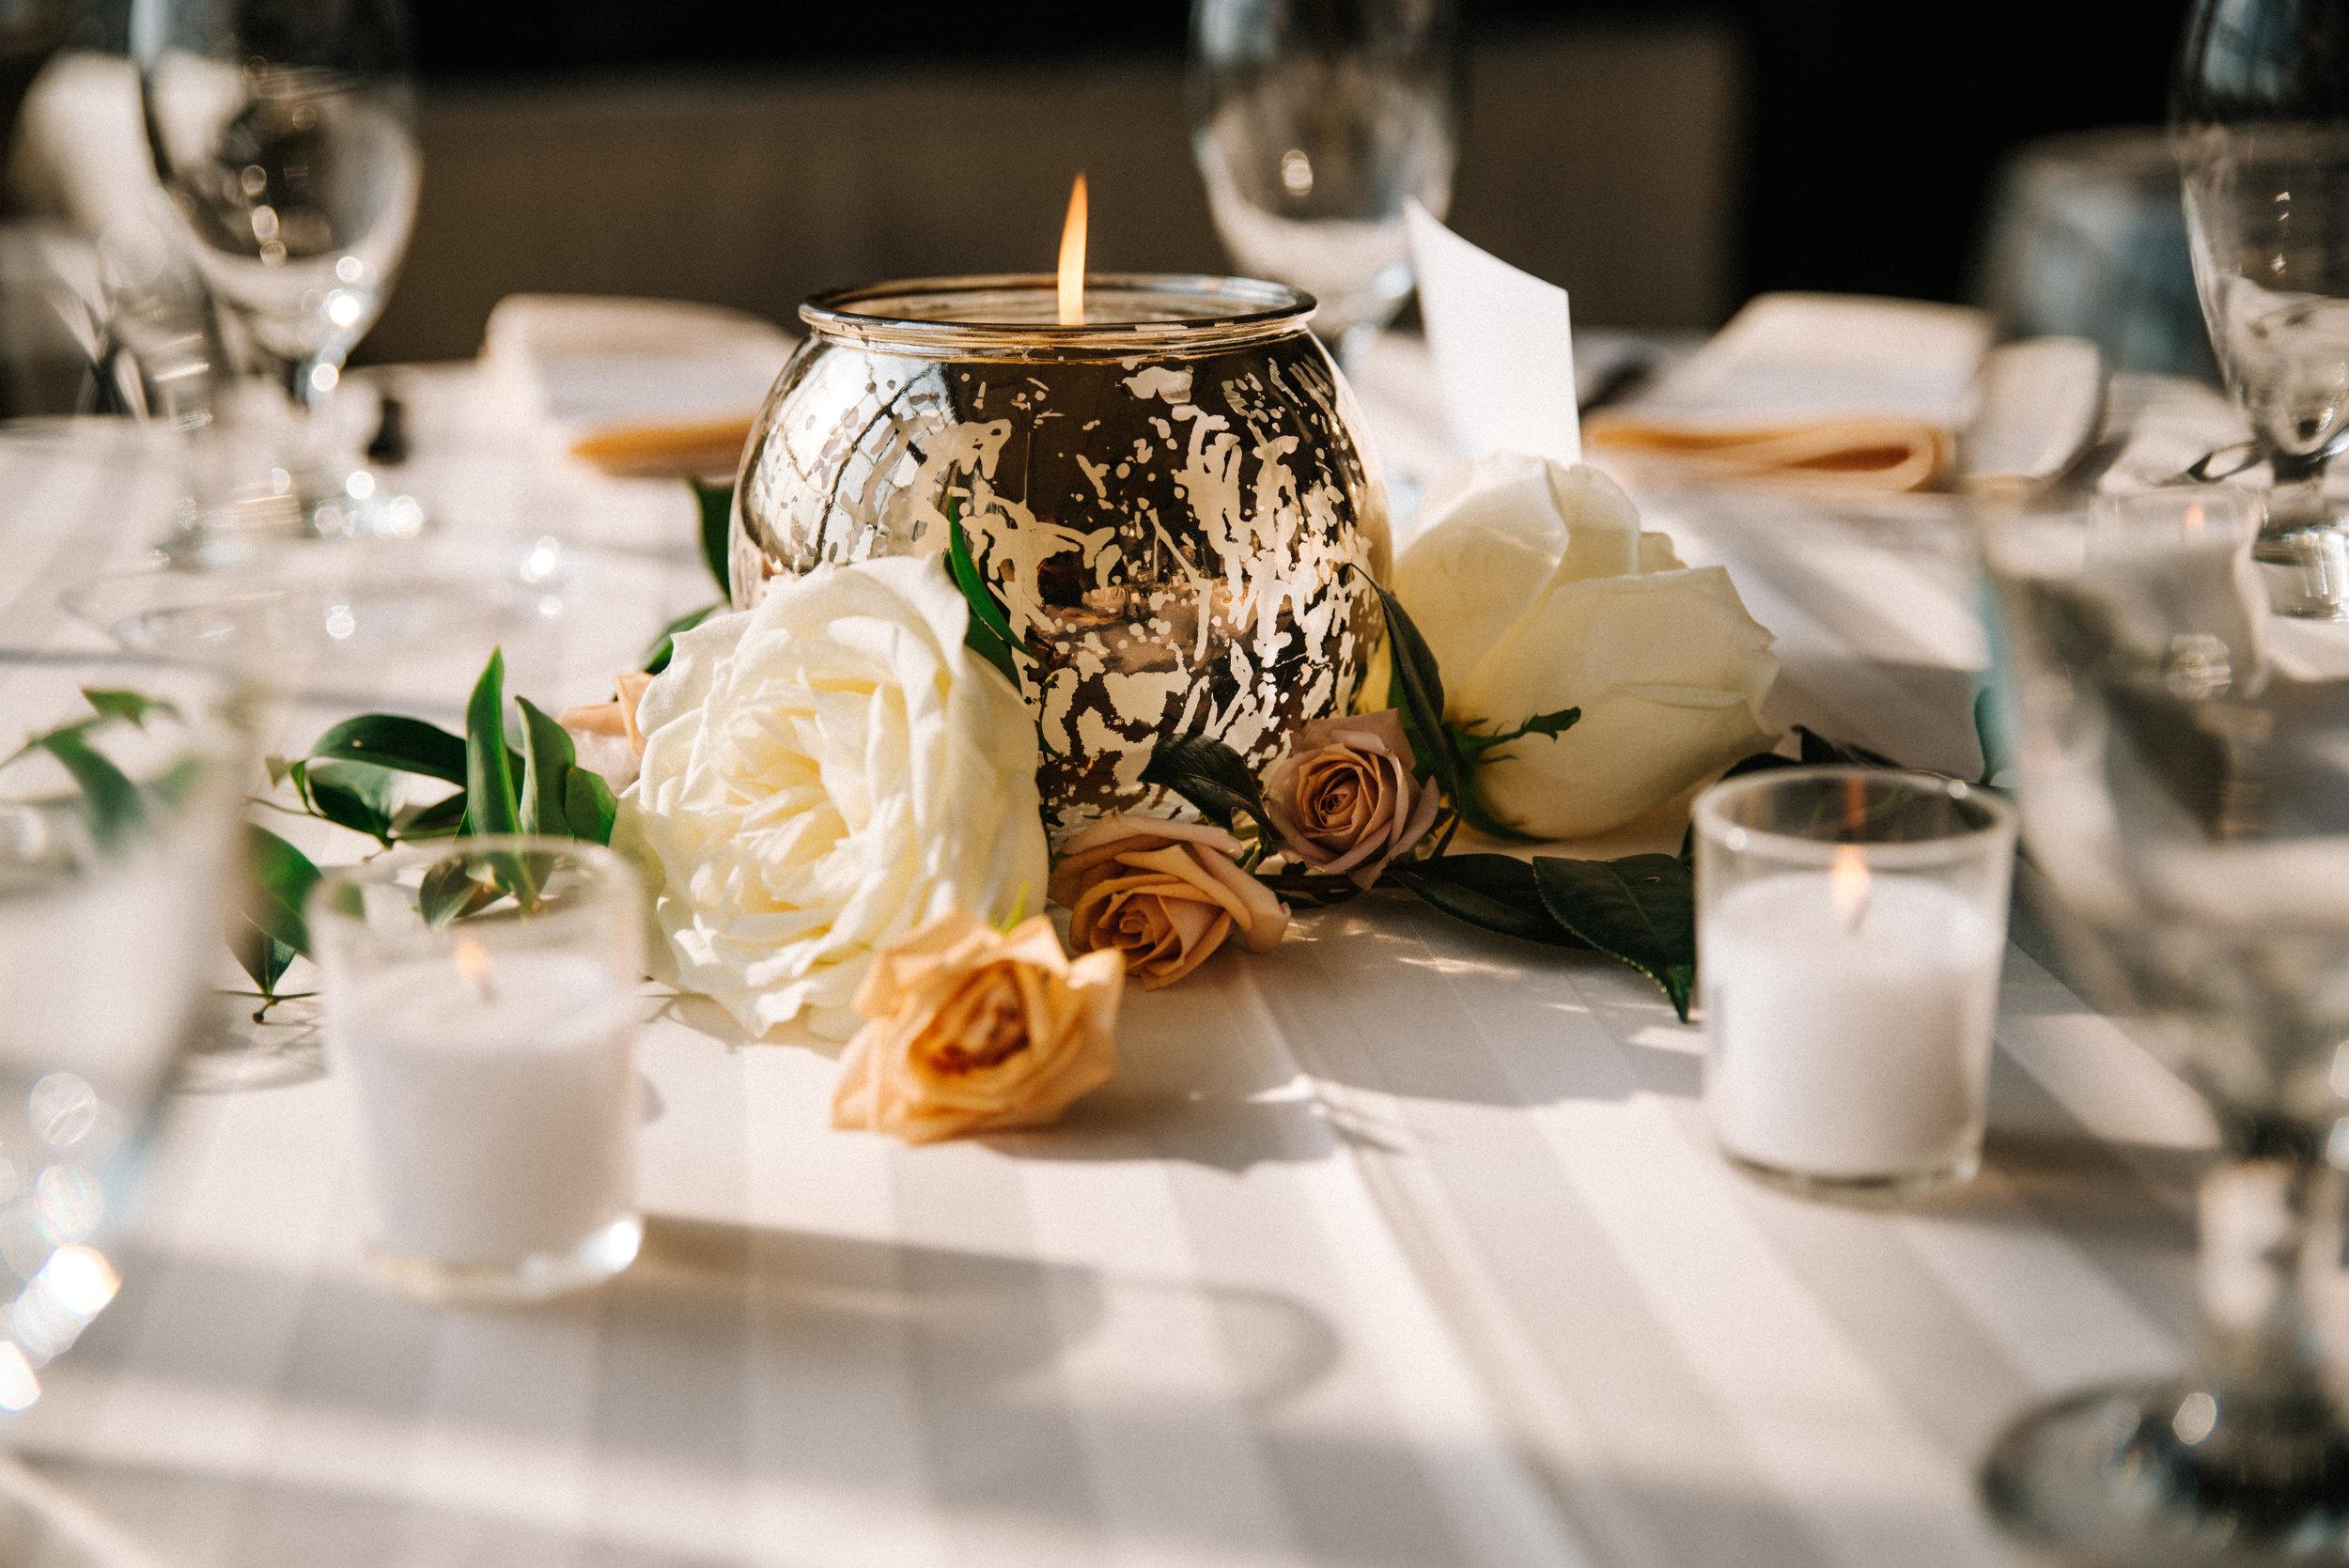 The Lofts at Union Square, High Point, NC. Reception Detail photos. North Carolina Wedding Photographer, Marina Rey Photography.